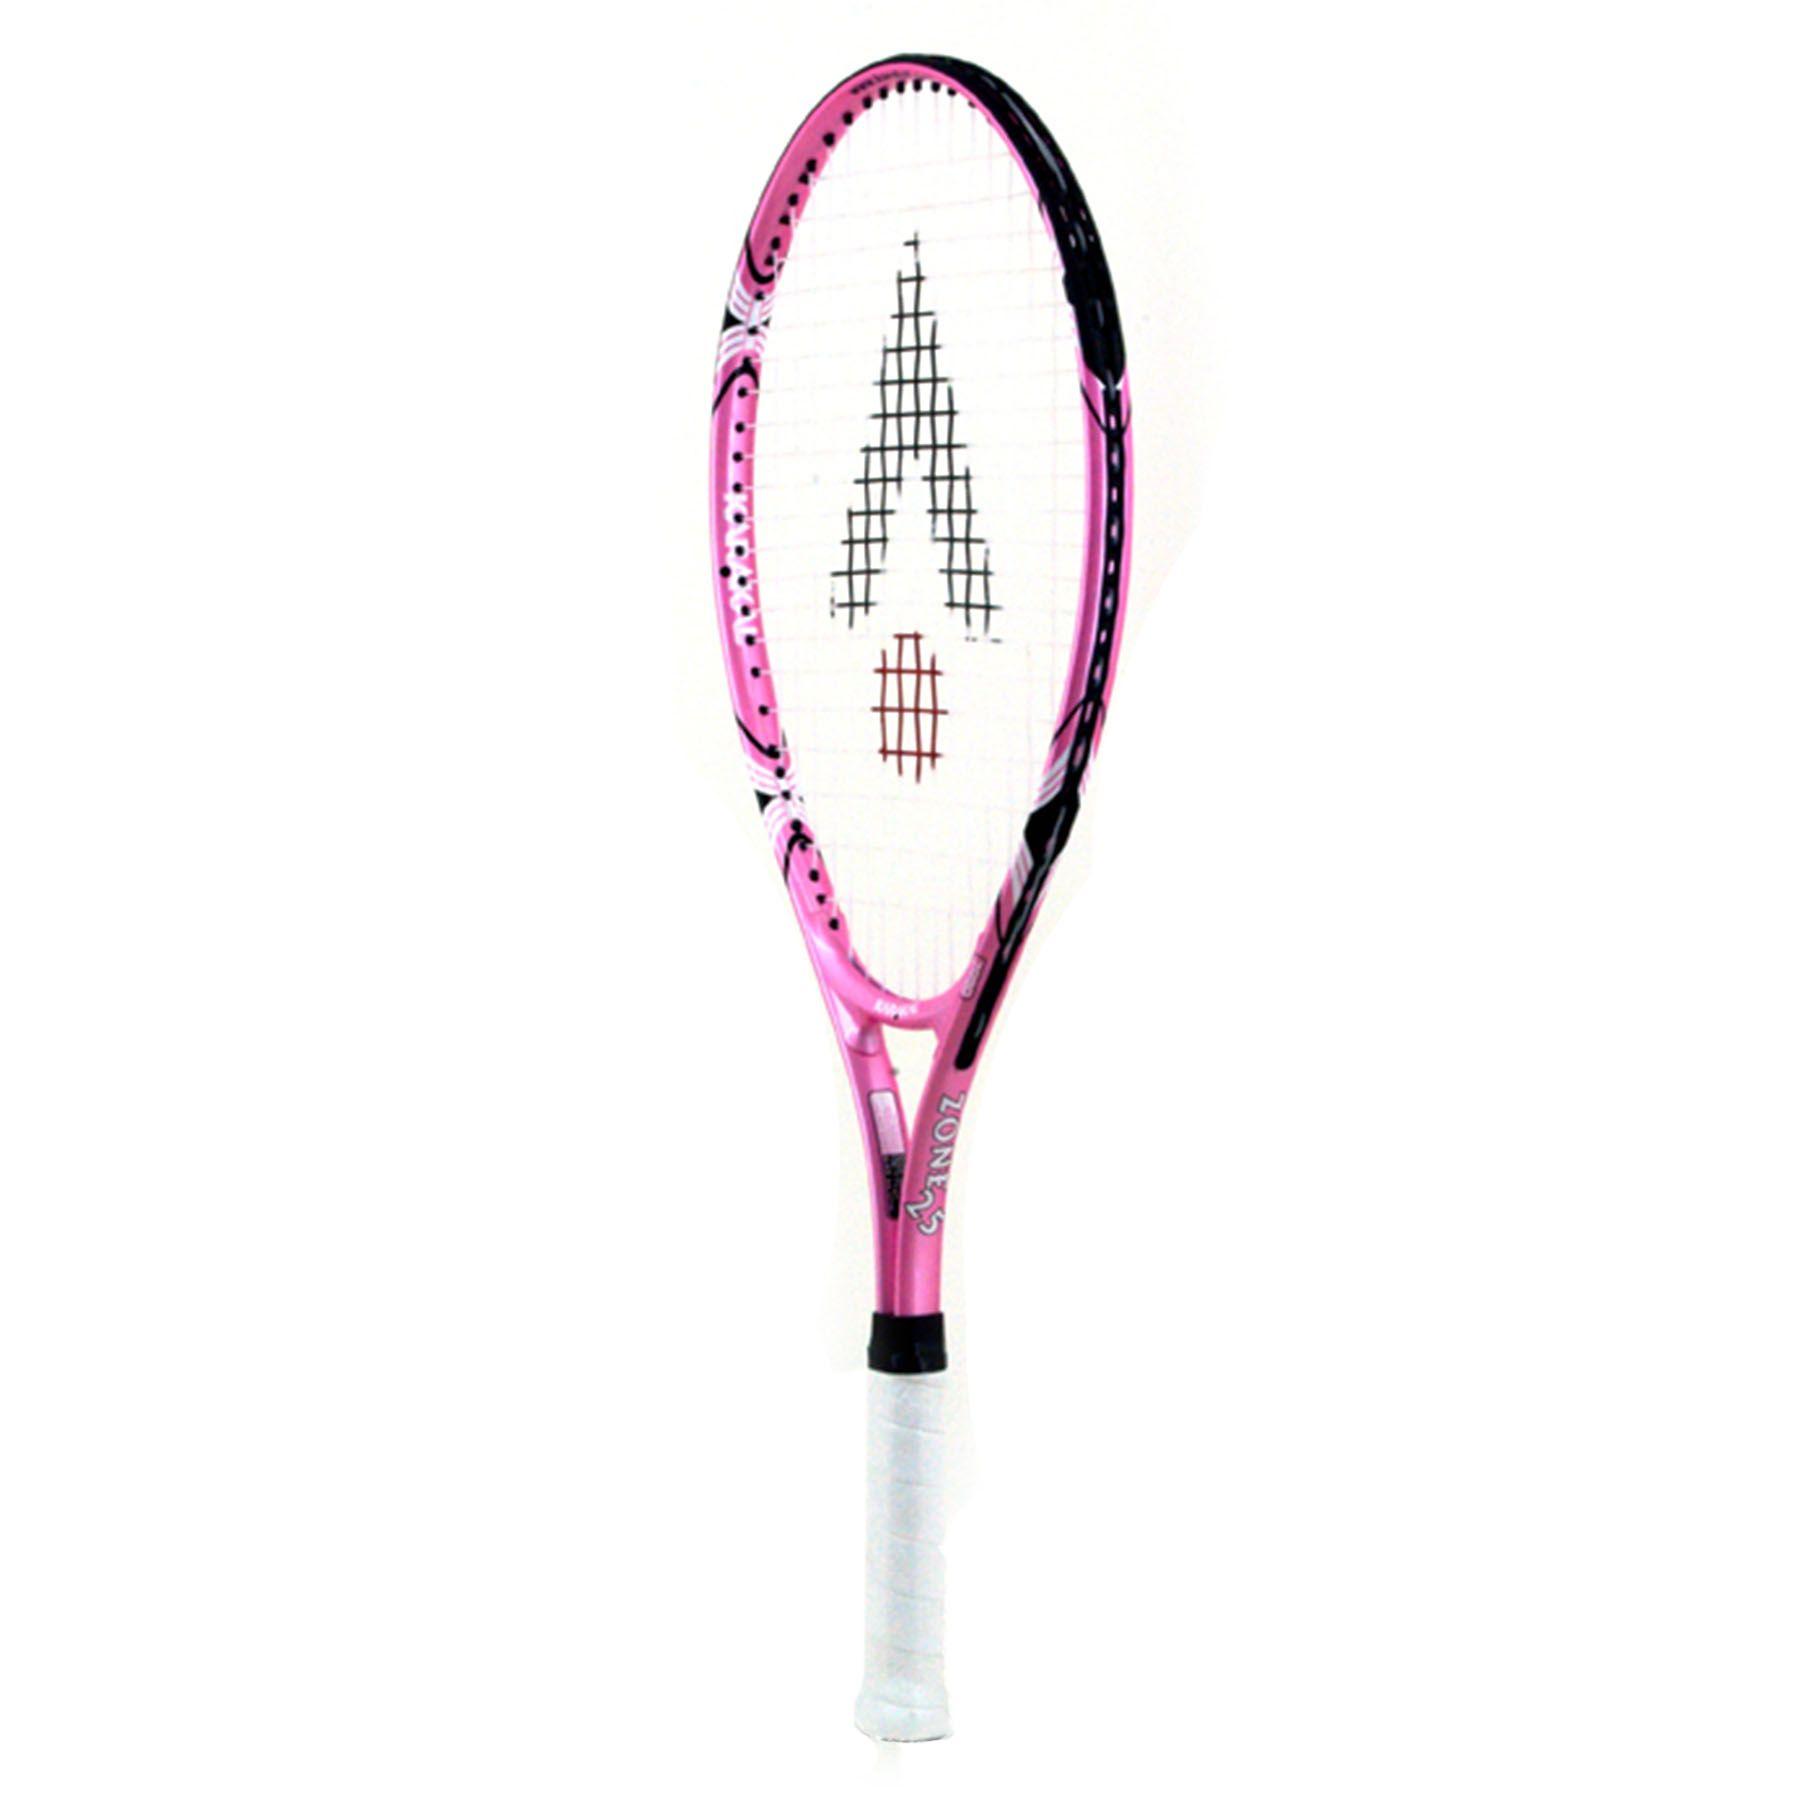 Karakal Zone 25 Pink Junior Tennis Racket - Sweatband.com